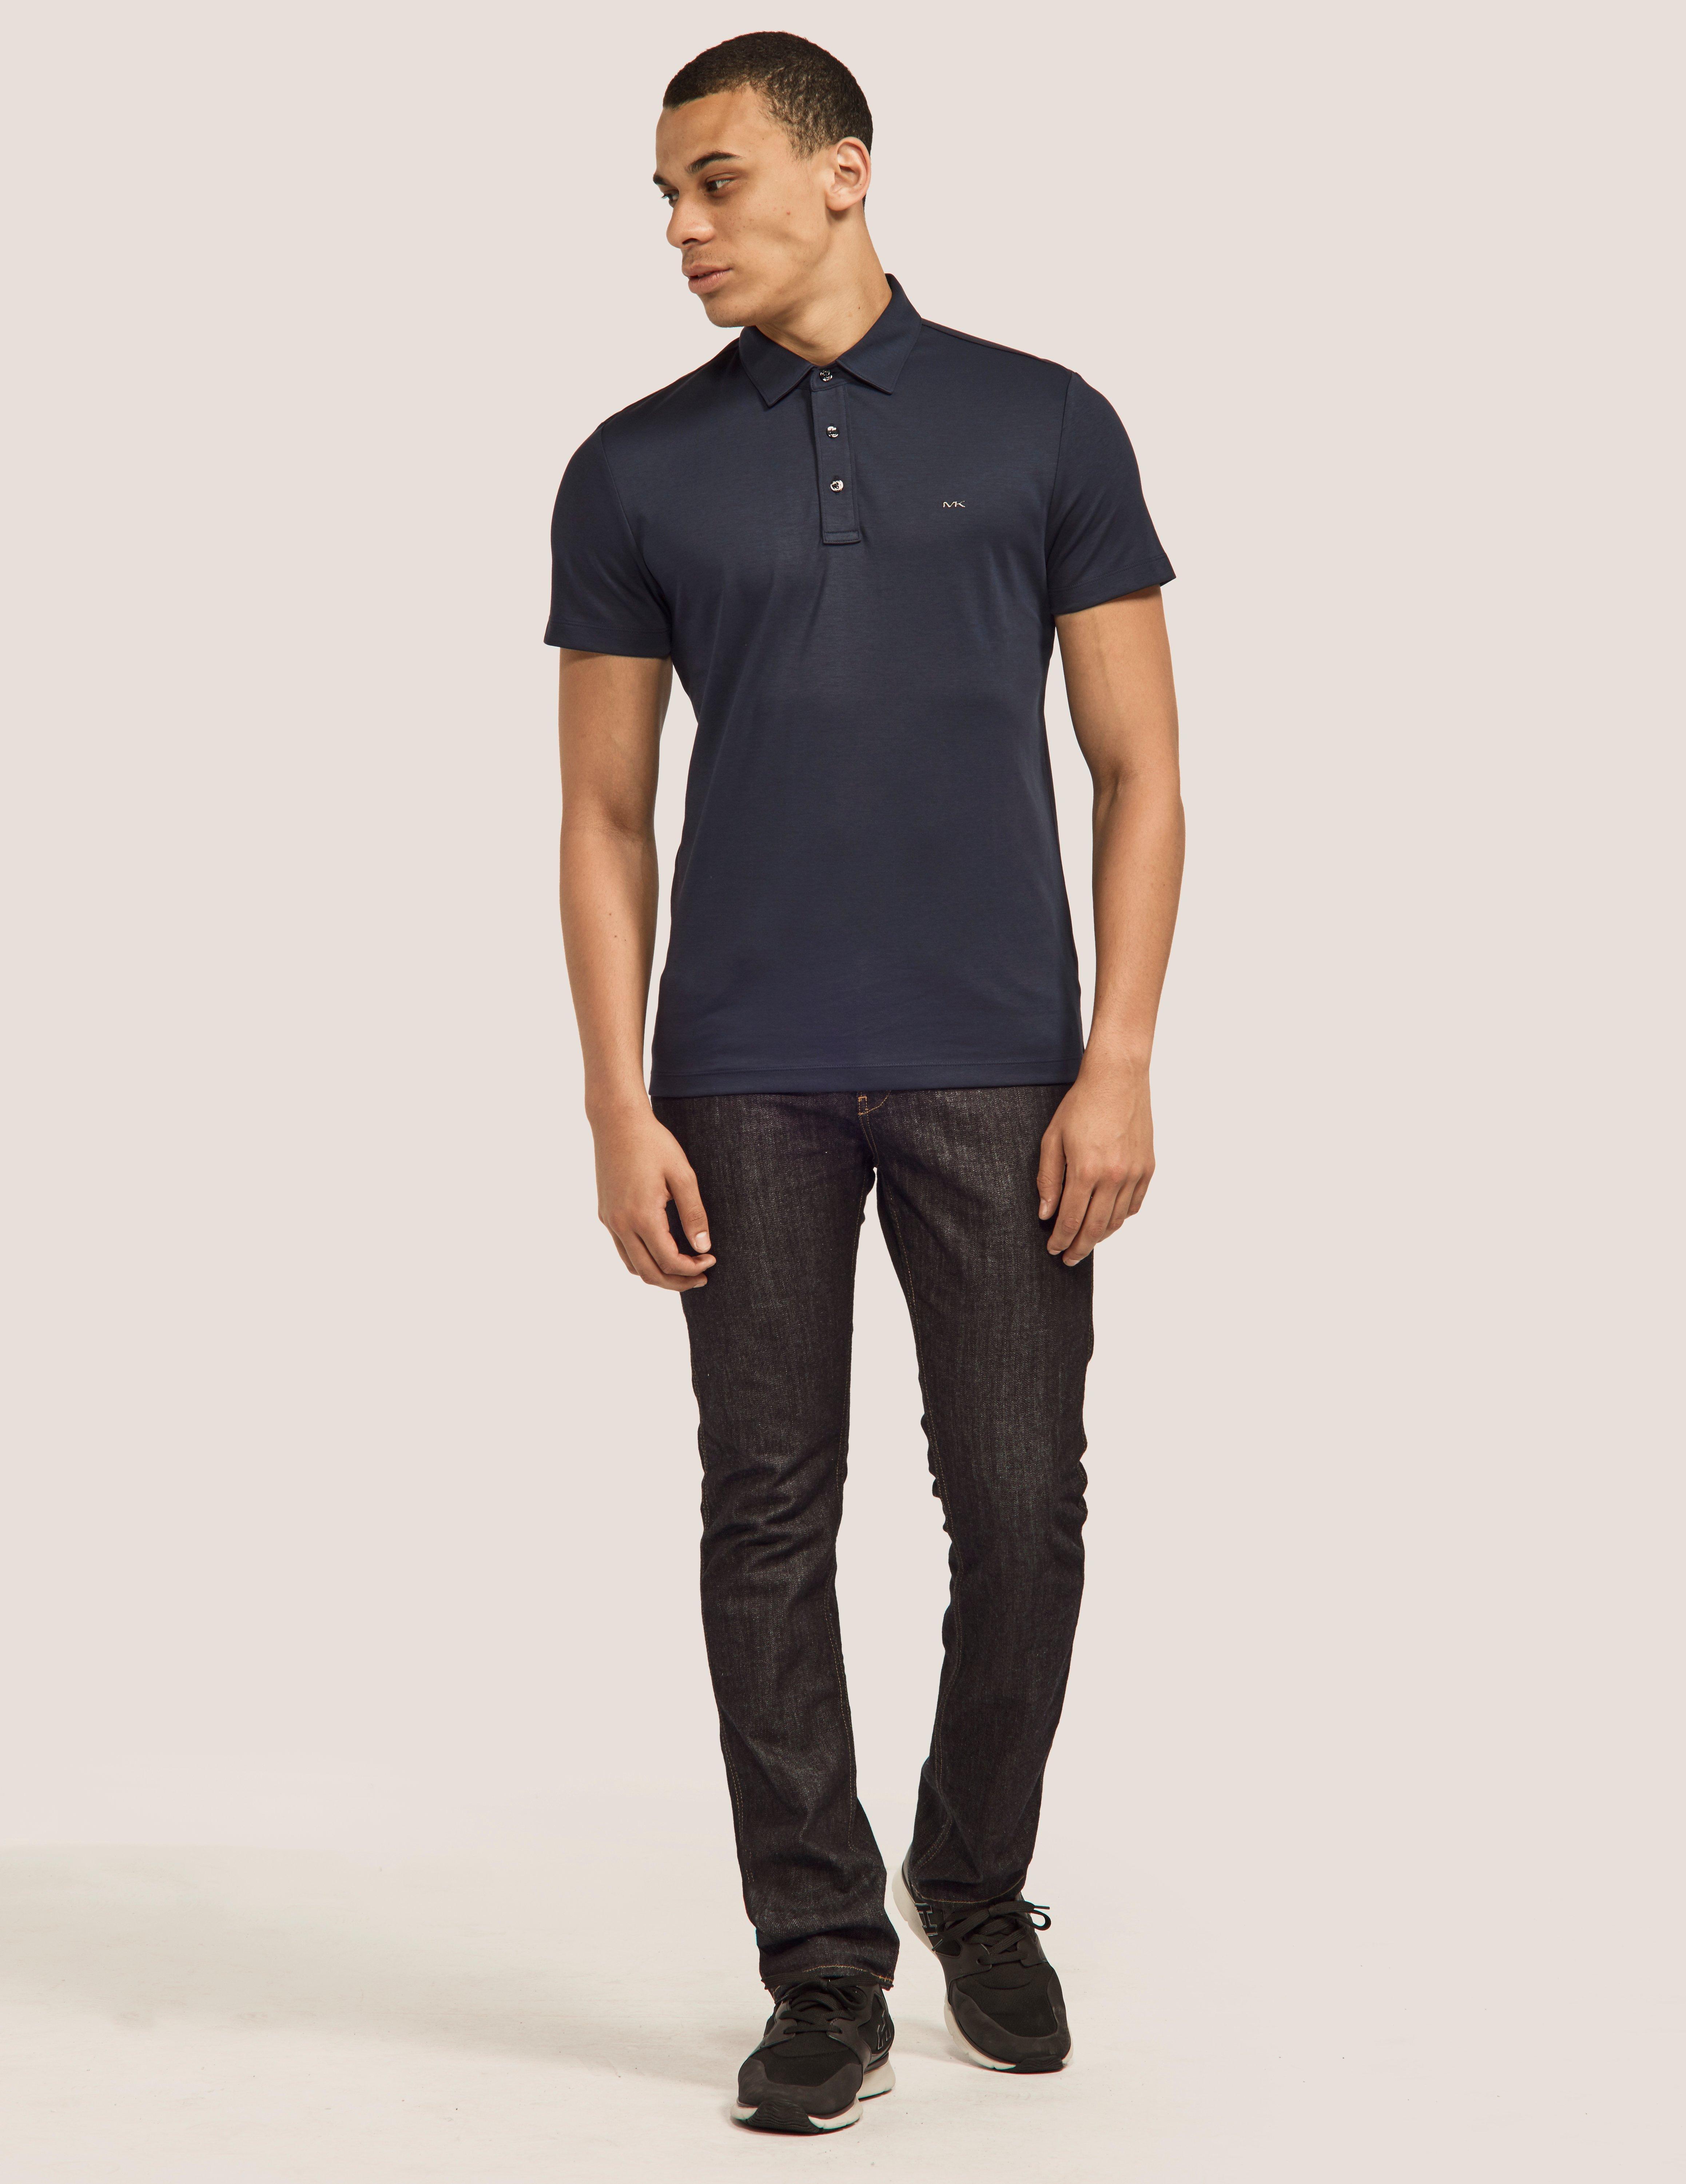 ecb5b0d1f Lyst - Michael Kors Mens Short Sleeve Sleek Polo Shirt Blue in Blue for Men  - Save 9.183673469387756%